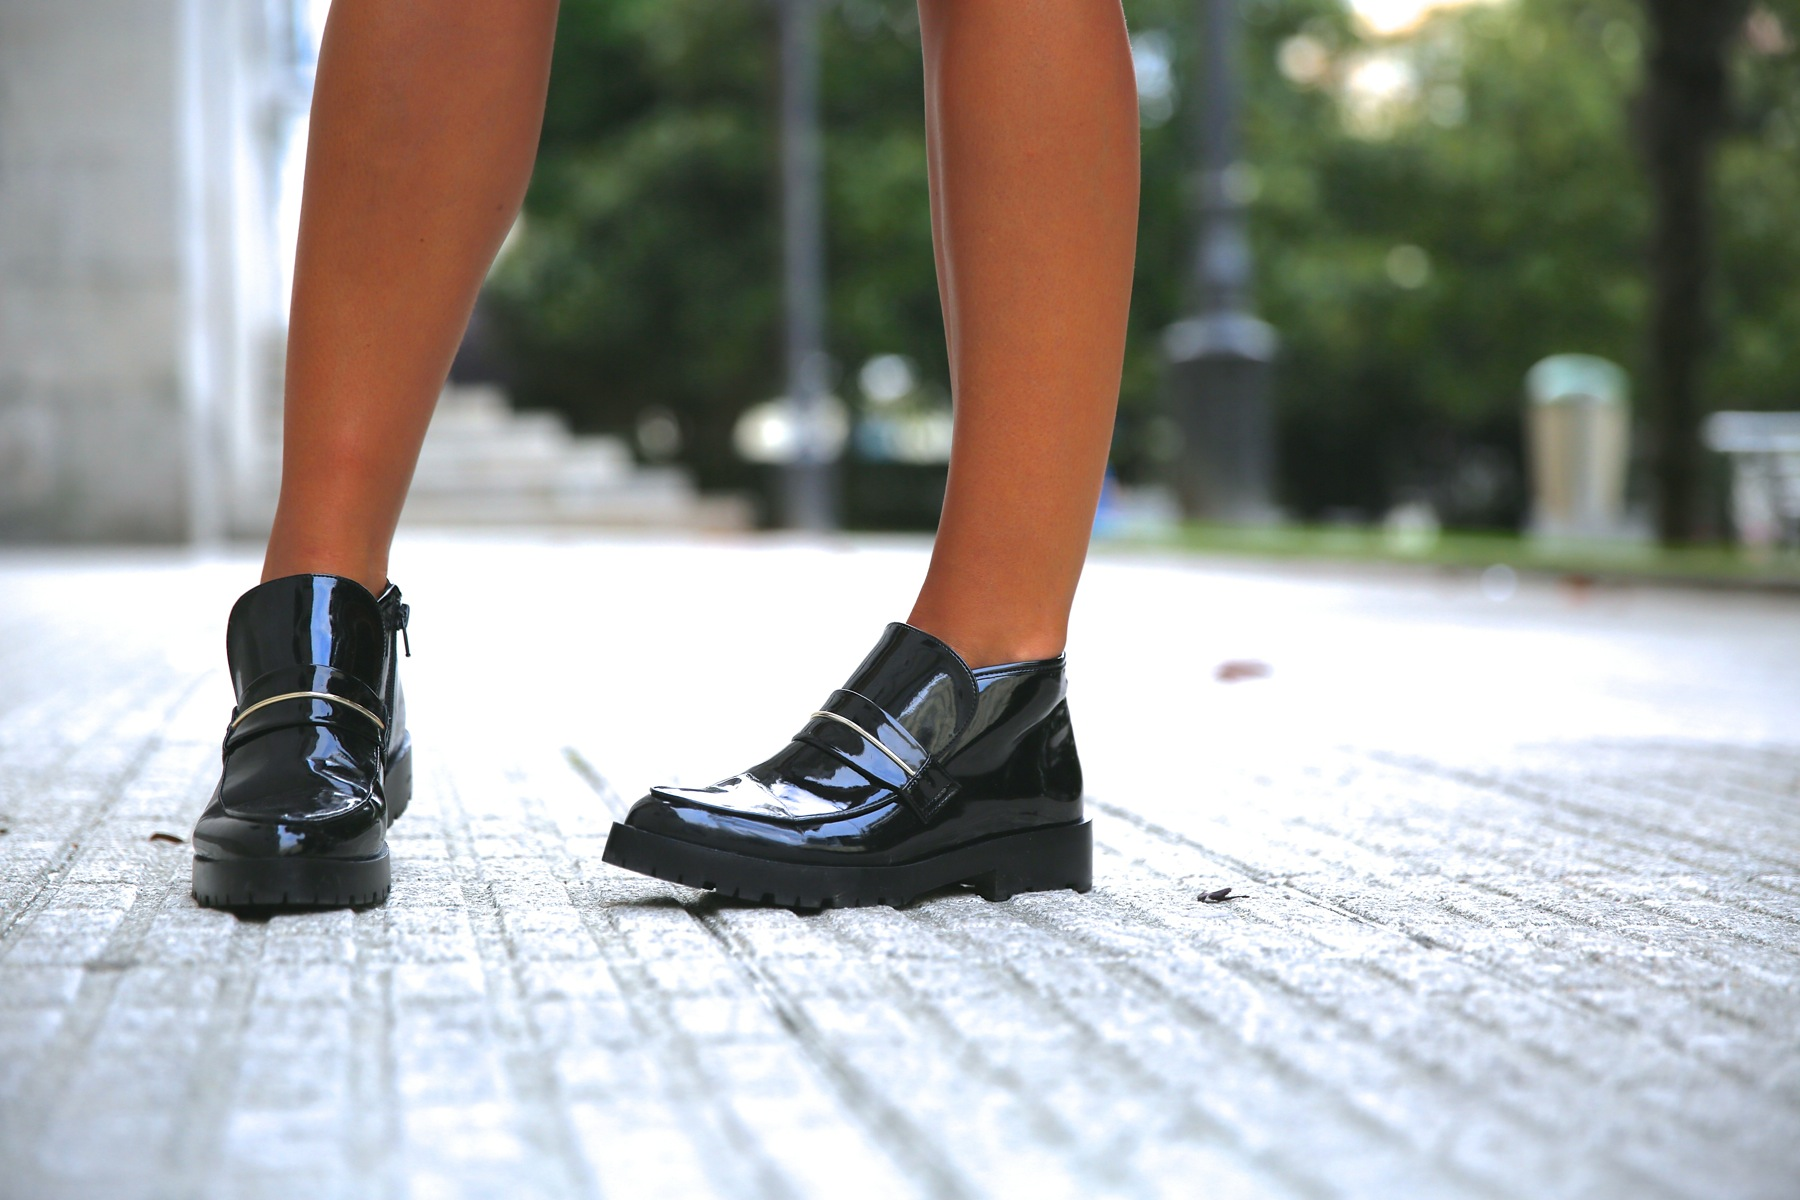 trendy_taste-look-outfit-street_style-ootd-blog-blogger-fashion_spain-moda_españa-khaki_blazer-blazer_caqui-flower_print-estampado_flores-shorts-botines_charol-1